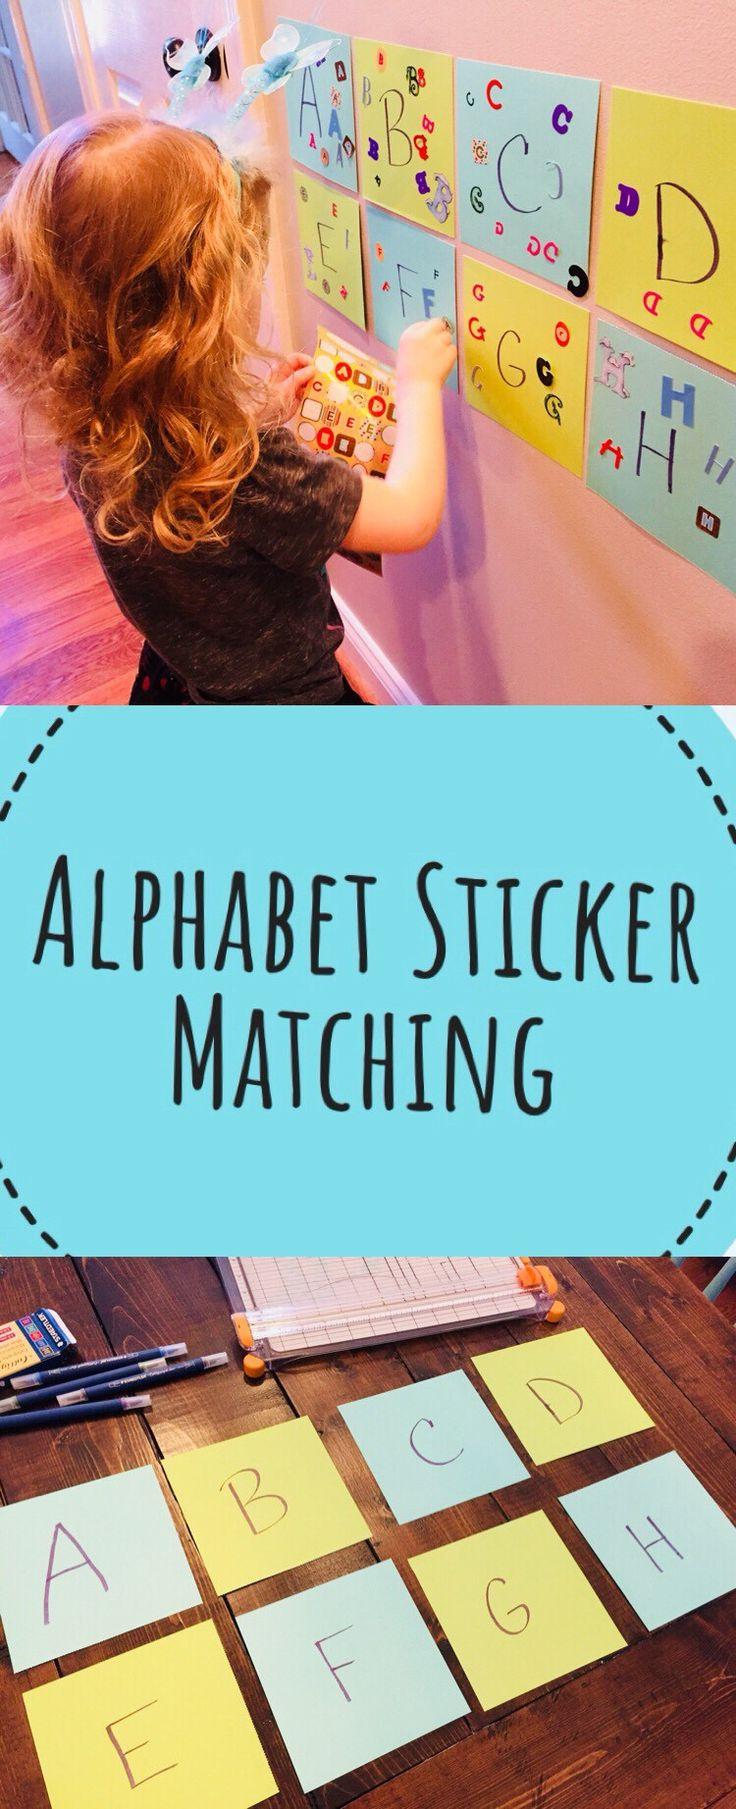 63 best Printable for kids images on Pinterest | School, Alphabet ...